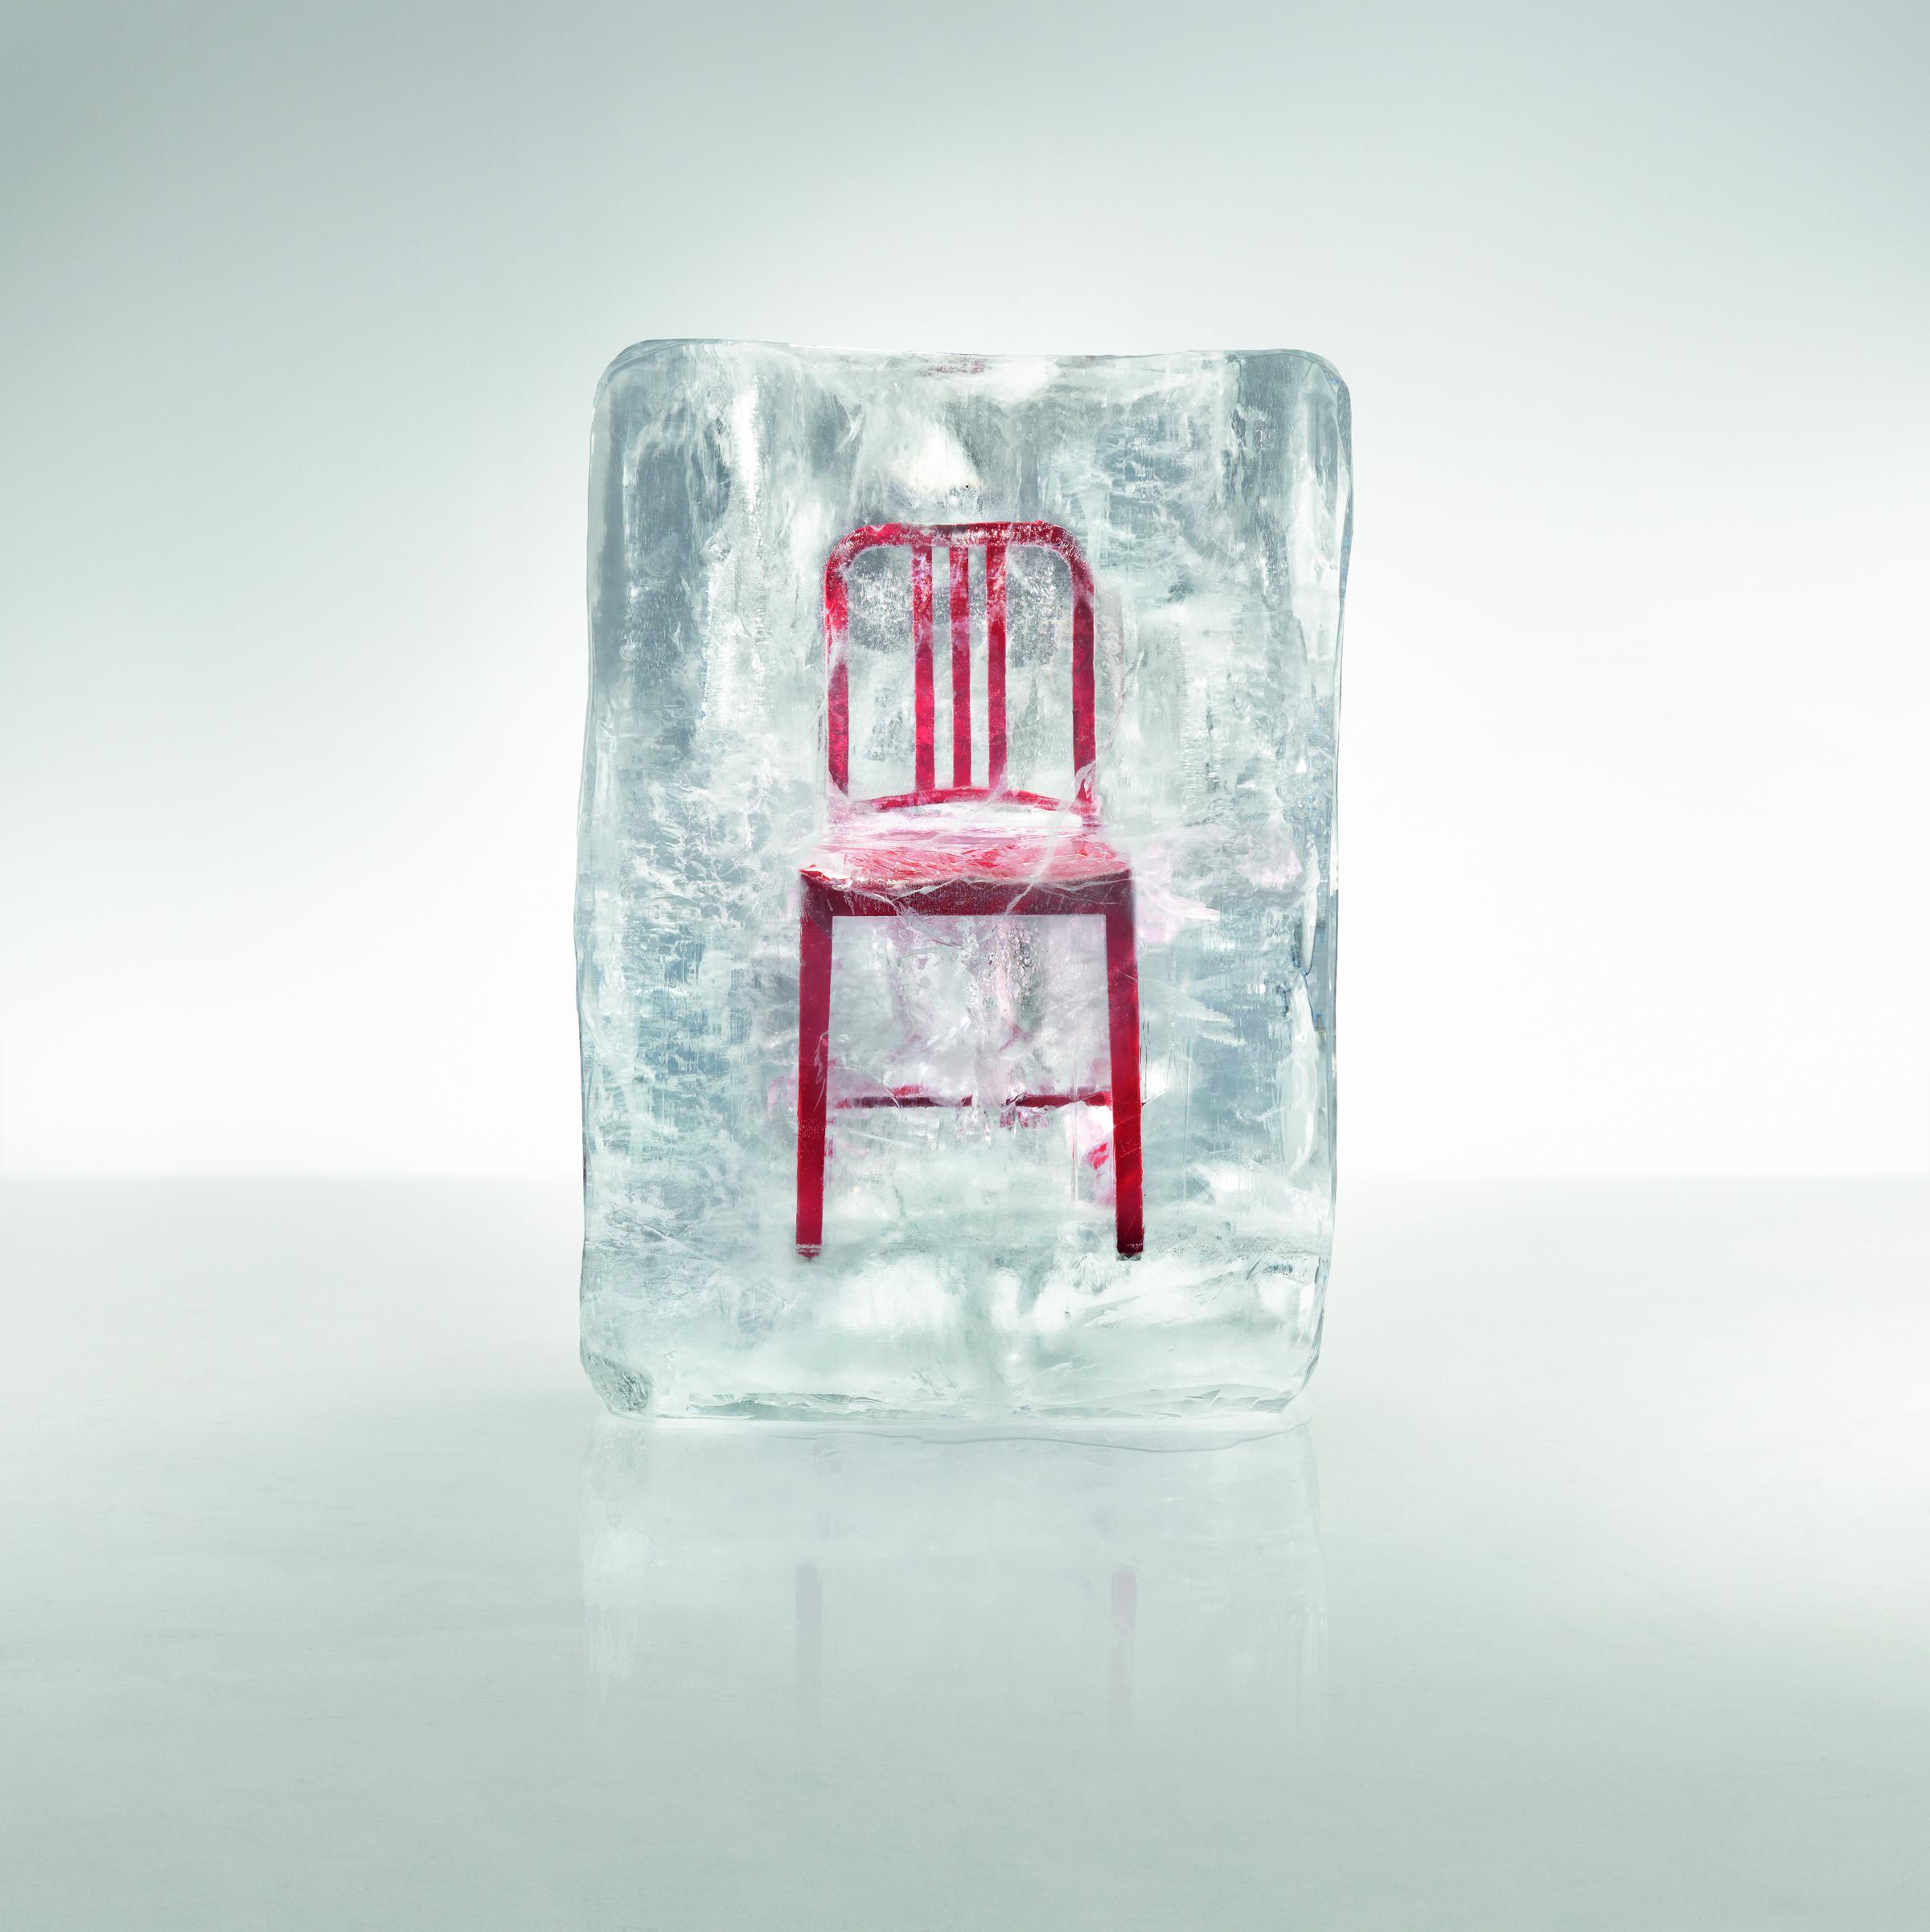 design and coke bottles ice cold branding cornerstore glory